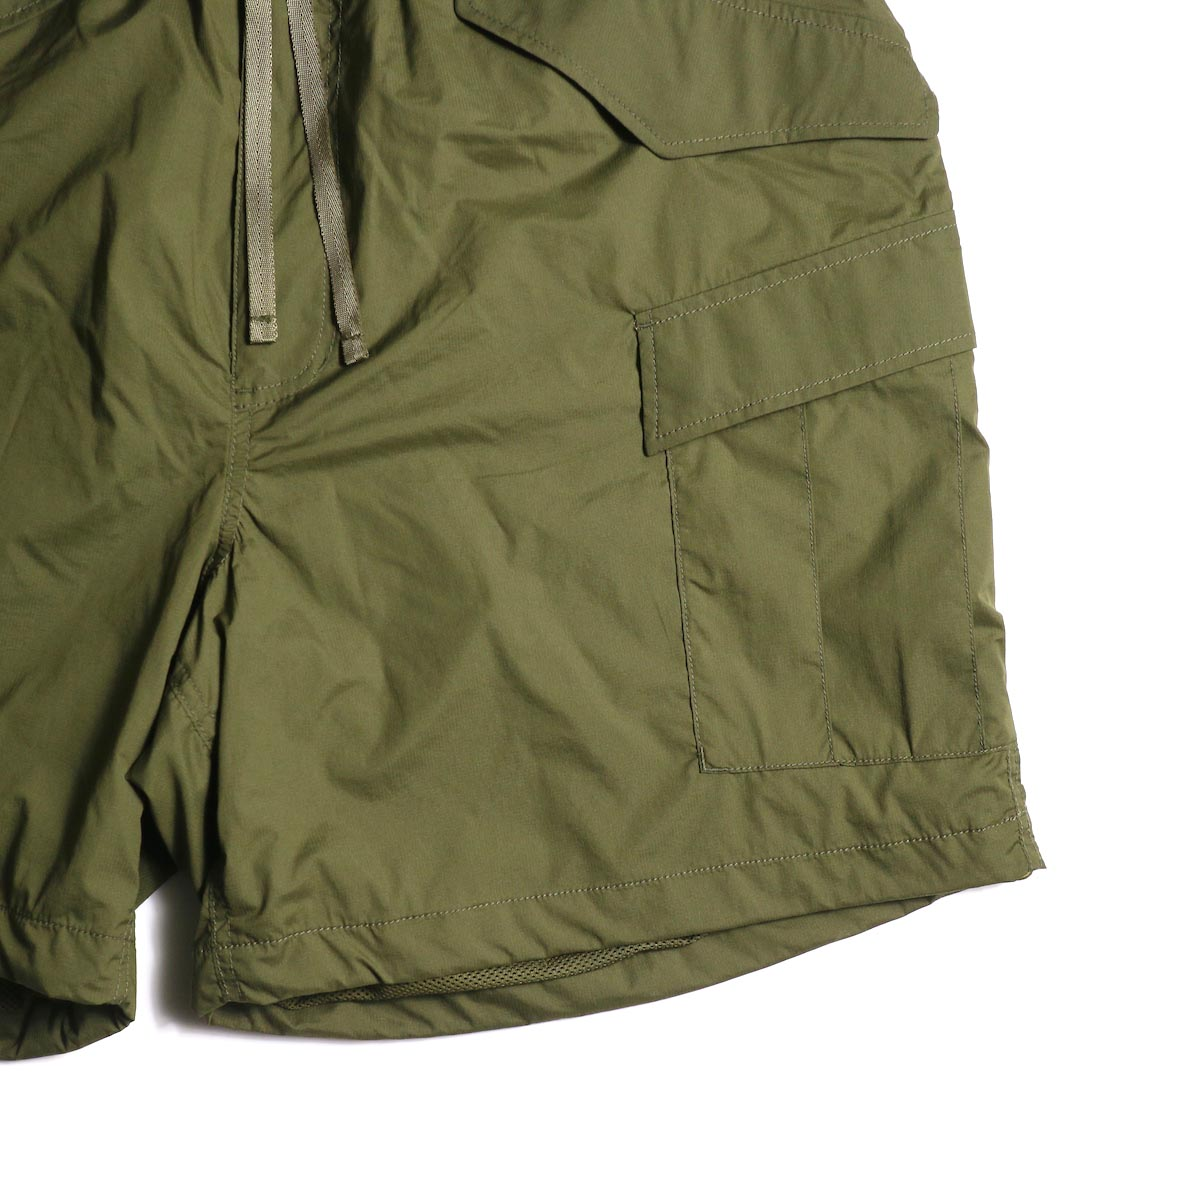 DAIWA PIER39 / Micro Rip-Stop Easy 6P Shorts (Dark Olive) ポケット